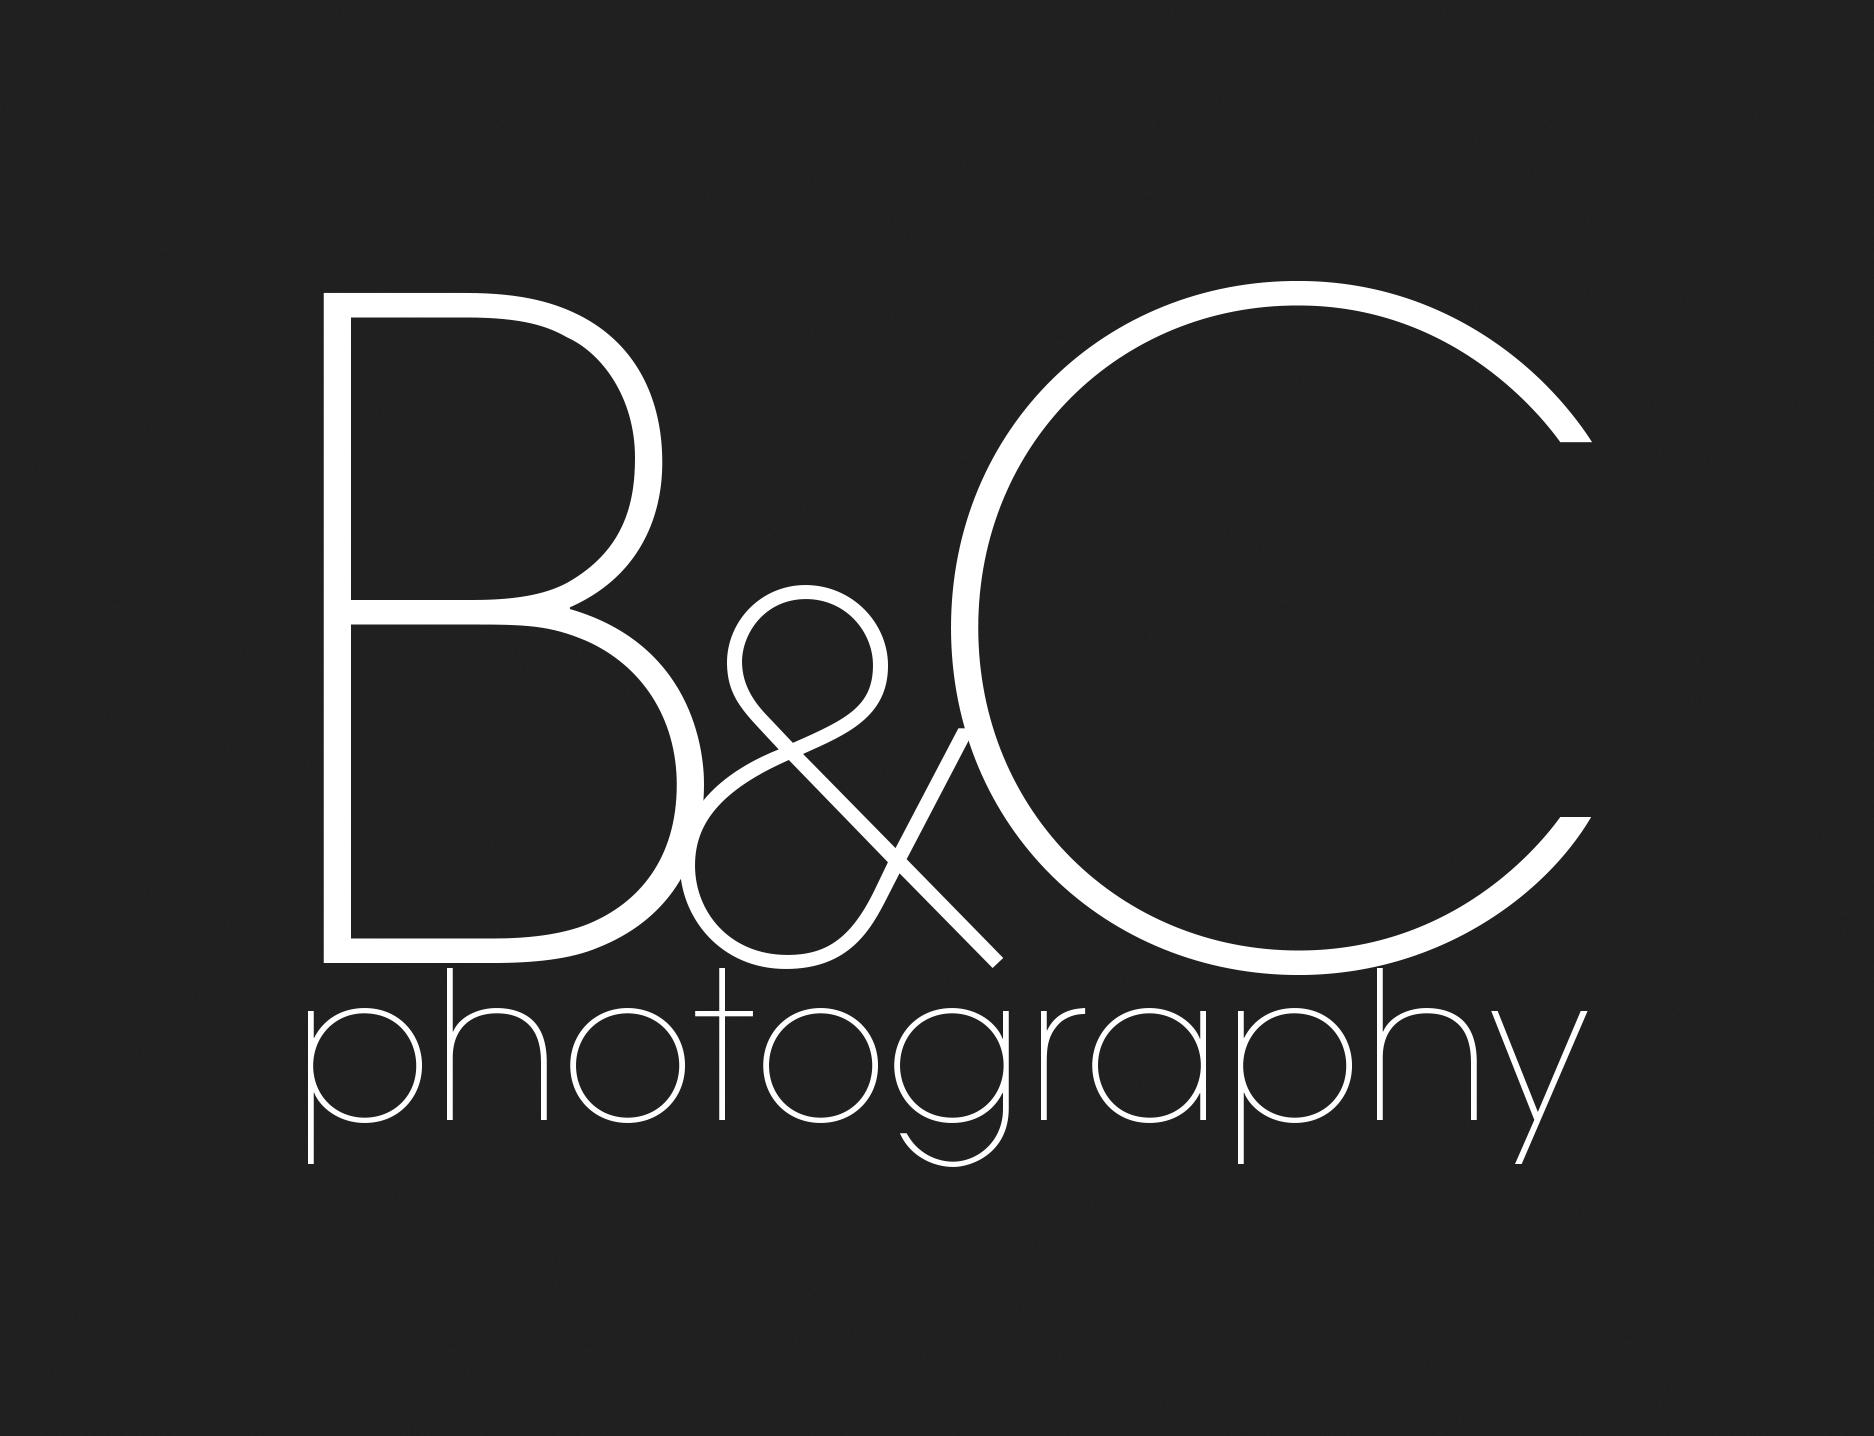 B & C Photography